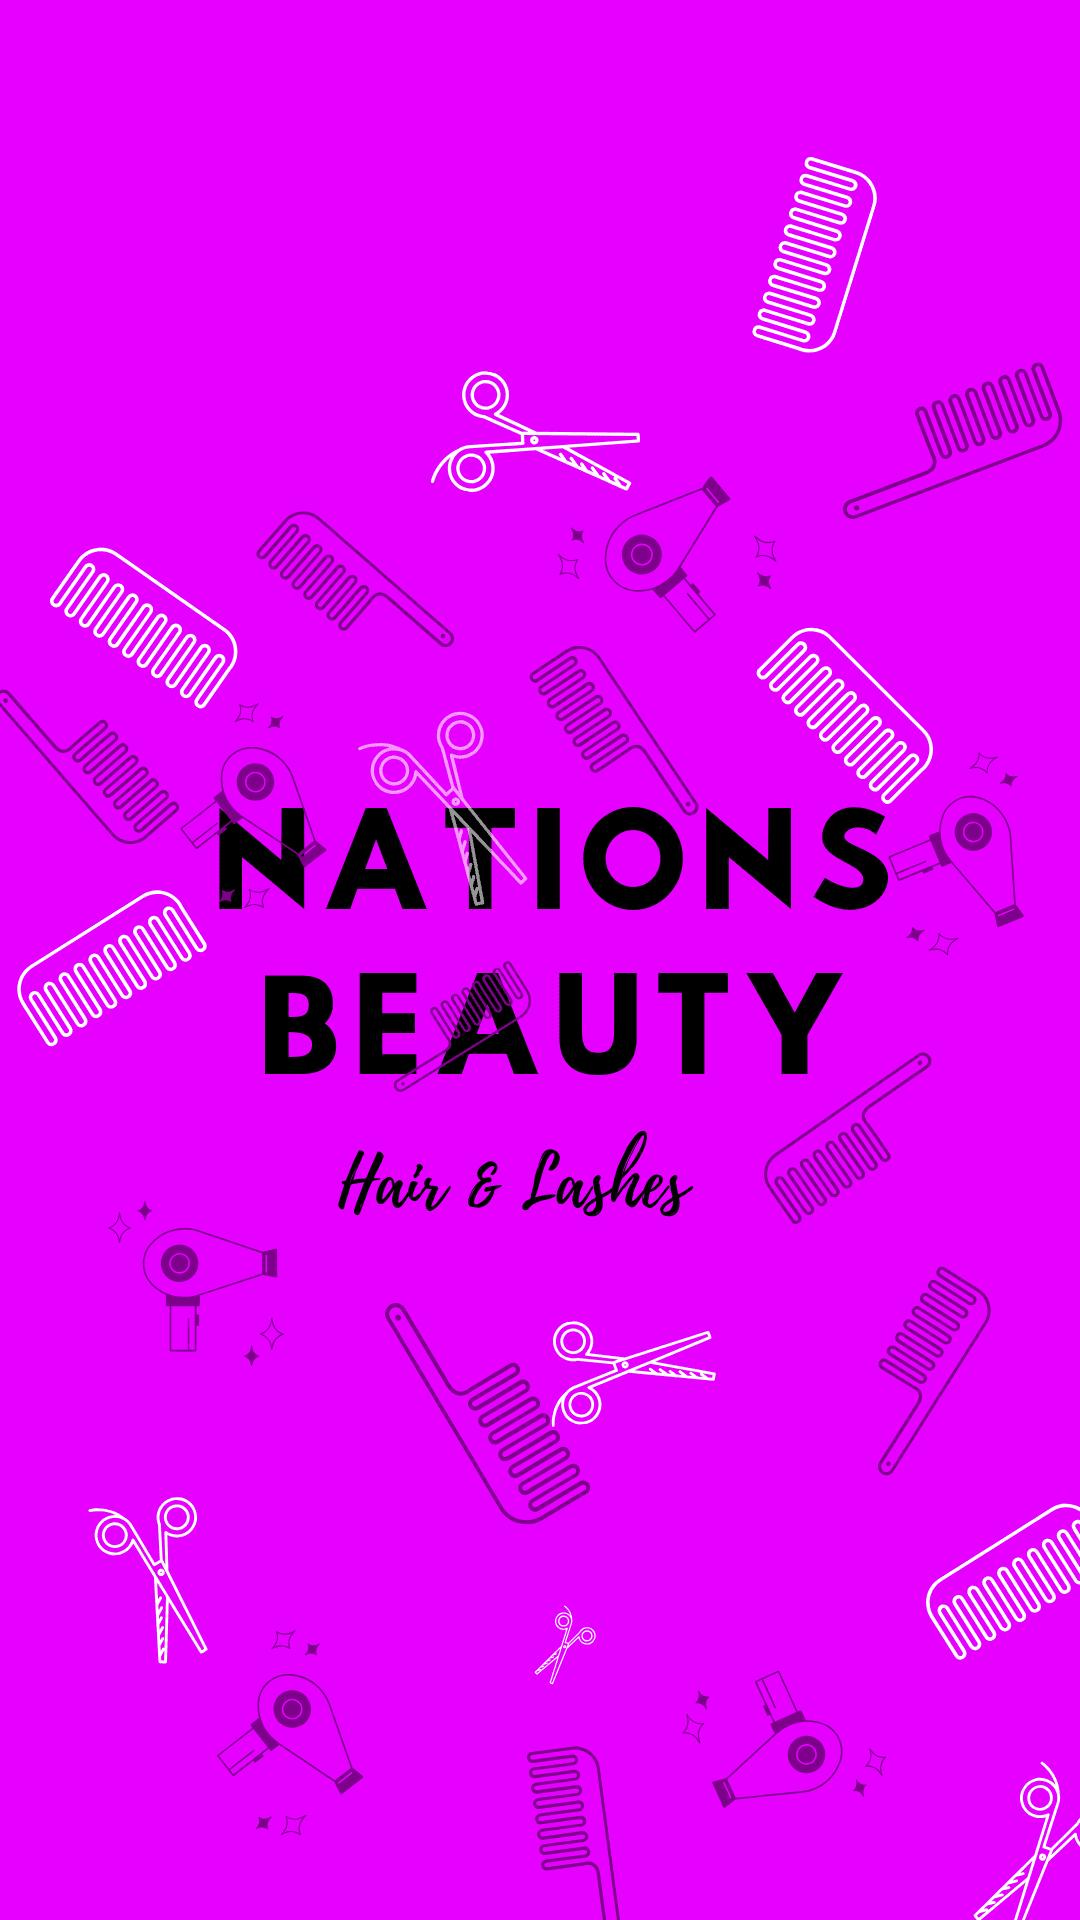 Nations Beauty